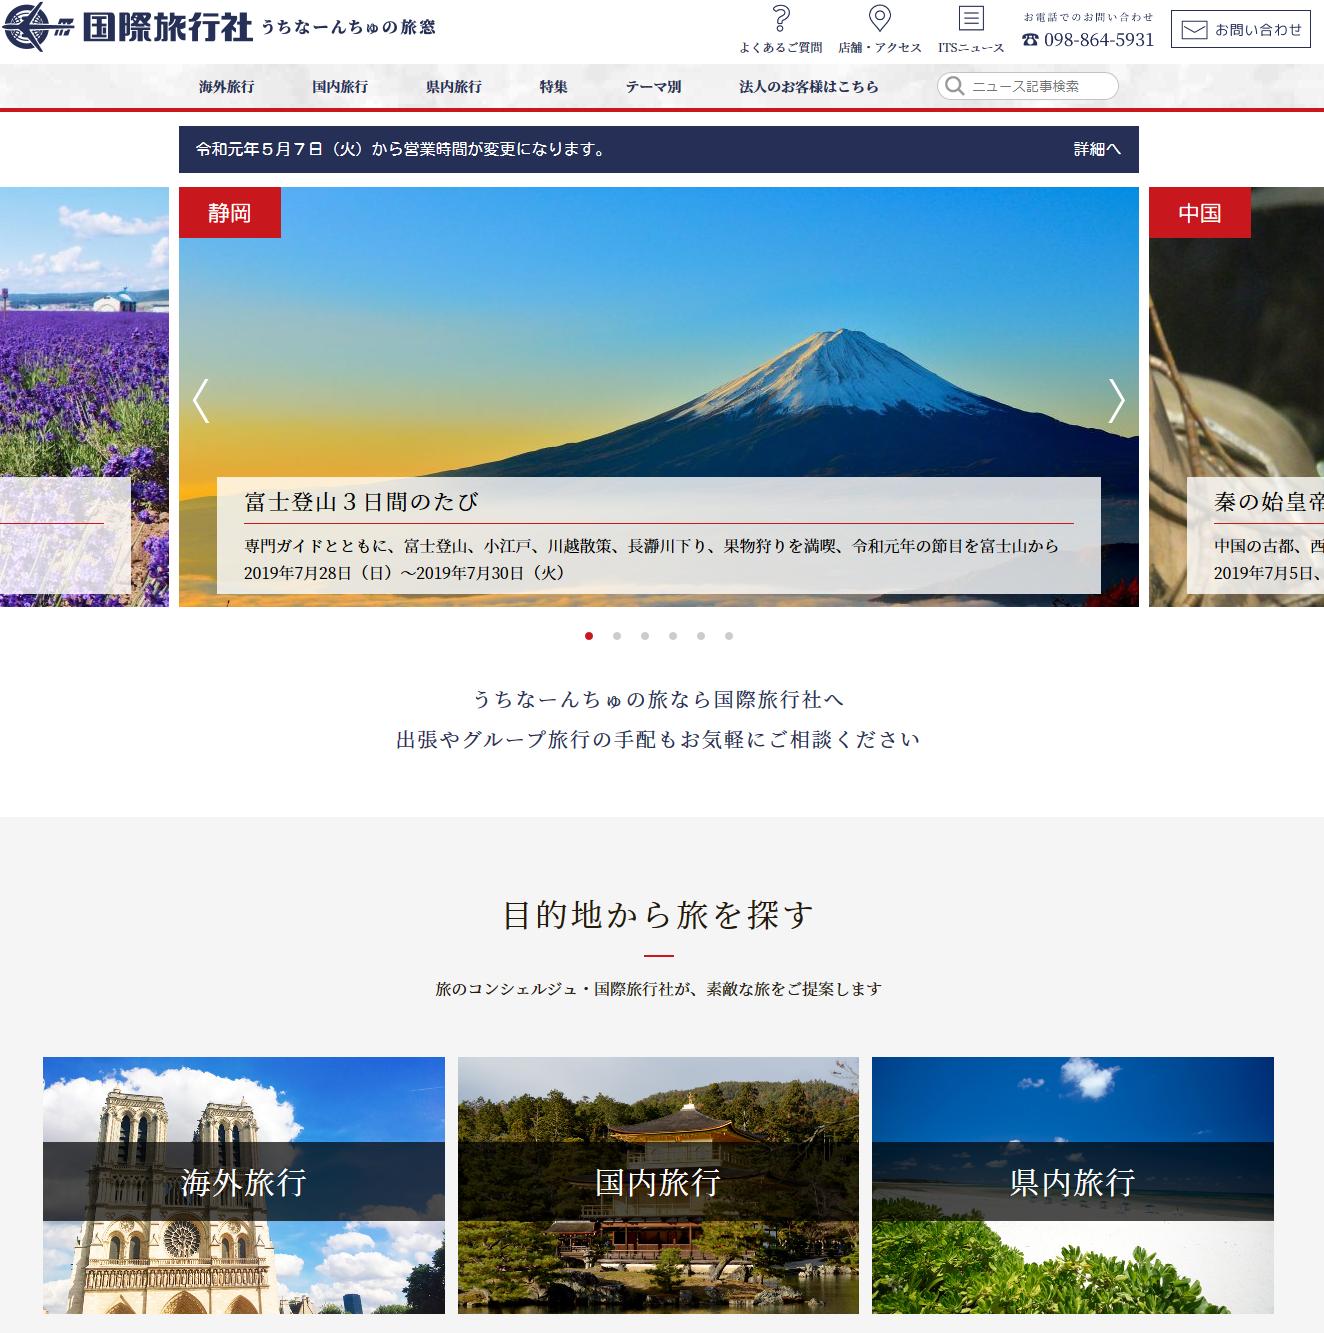 ホームページ制作事例株式会社 国際旅行社様